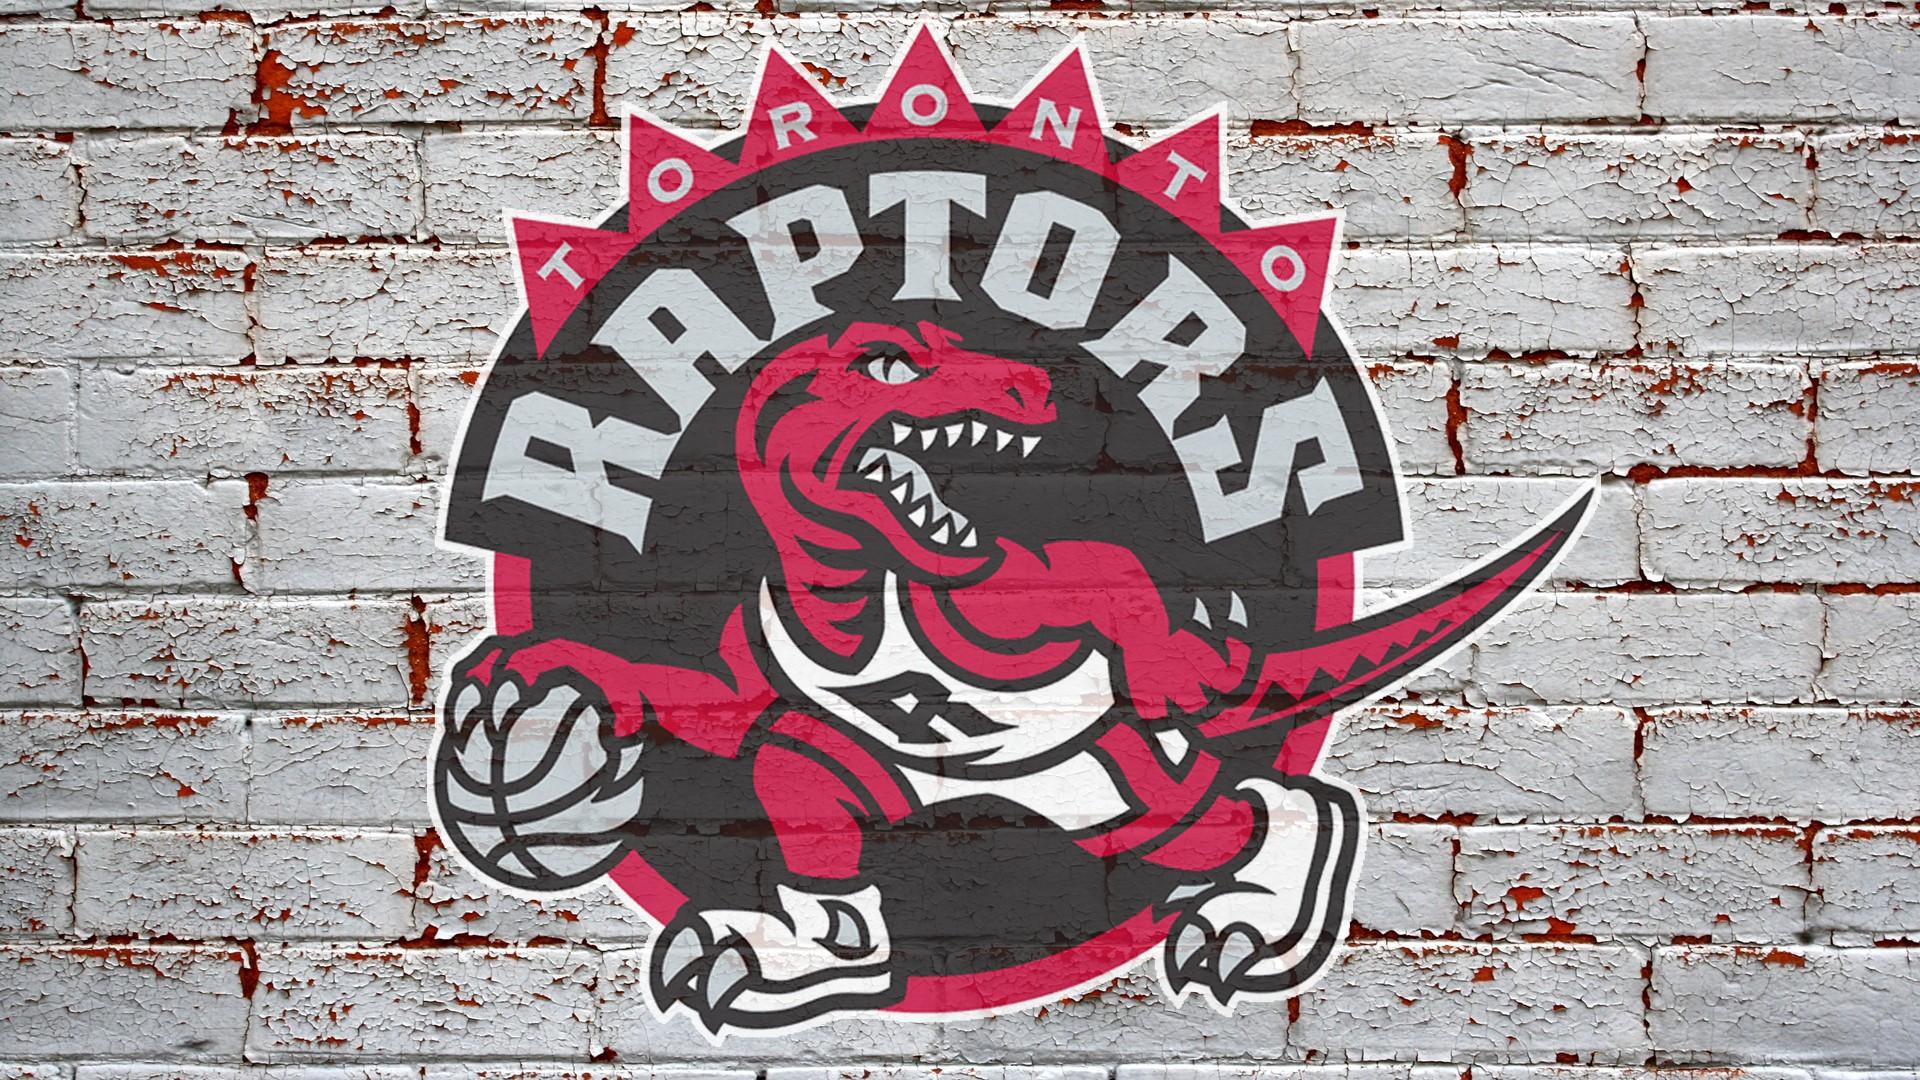 Toronto Raptors Nba Champions Wallpapers: TORONTO RAPTORS Basketball Nba W Wallpaper